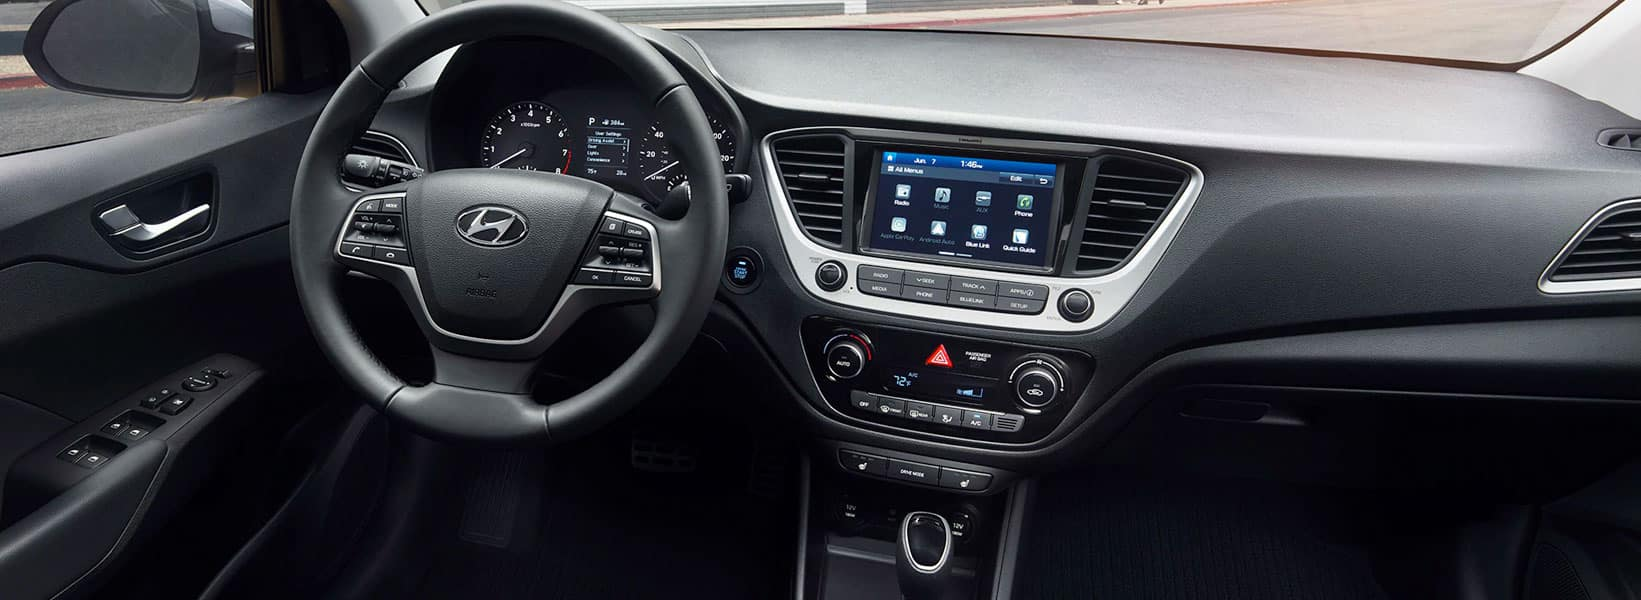 2019 Hyundai Accent Features Chicago IL